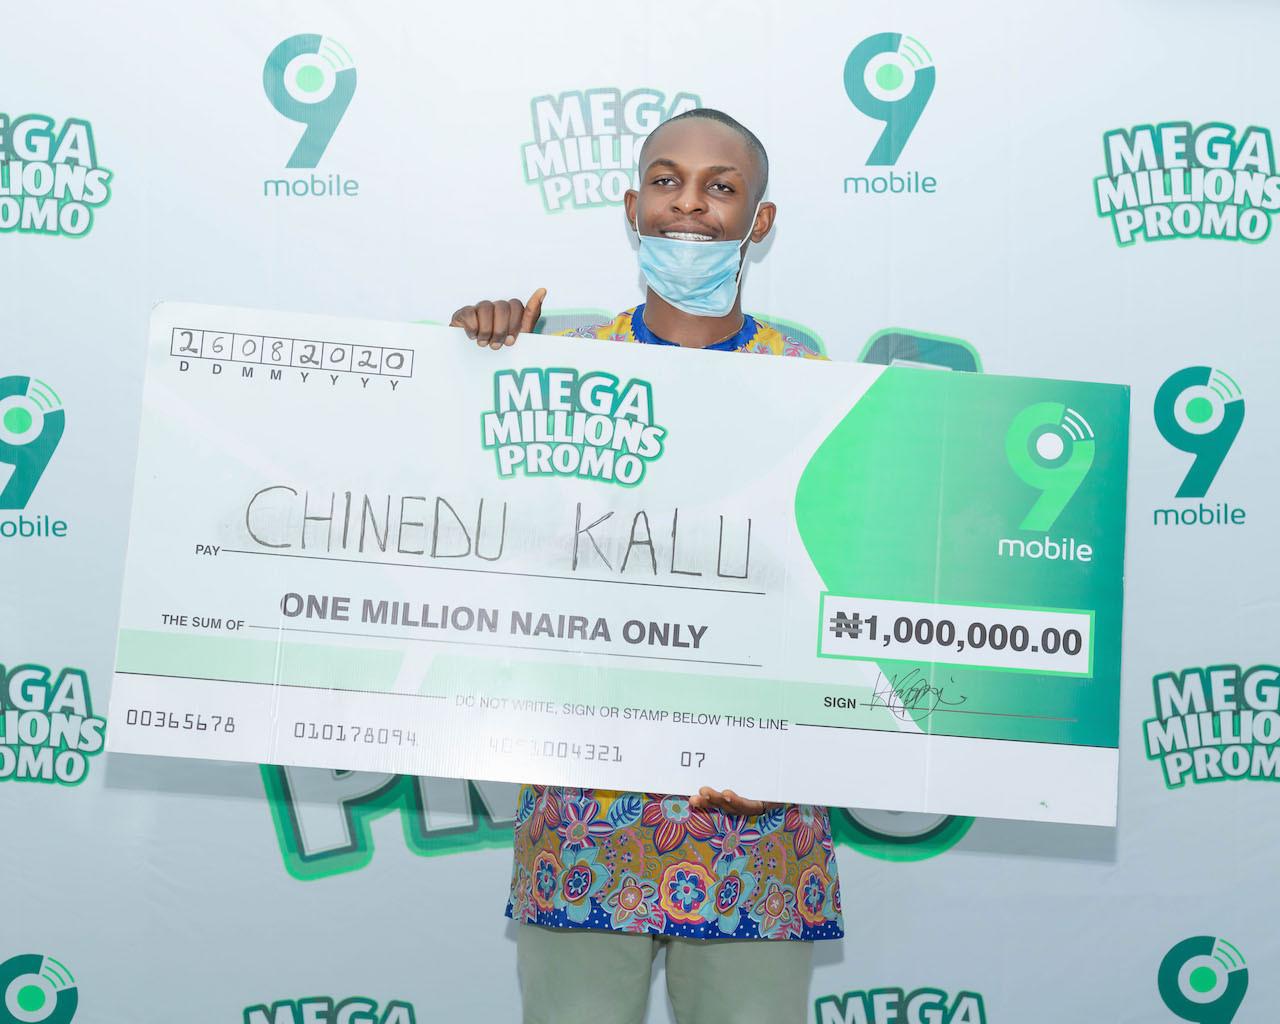 Clock ticking with 26 million Naira left to be won in ongoing 9mobile Mega Millions Promo lindaikejisblog5